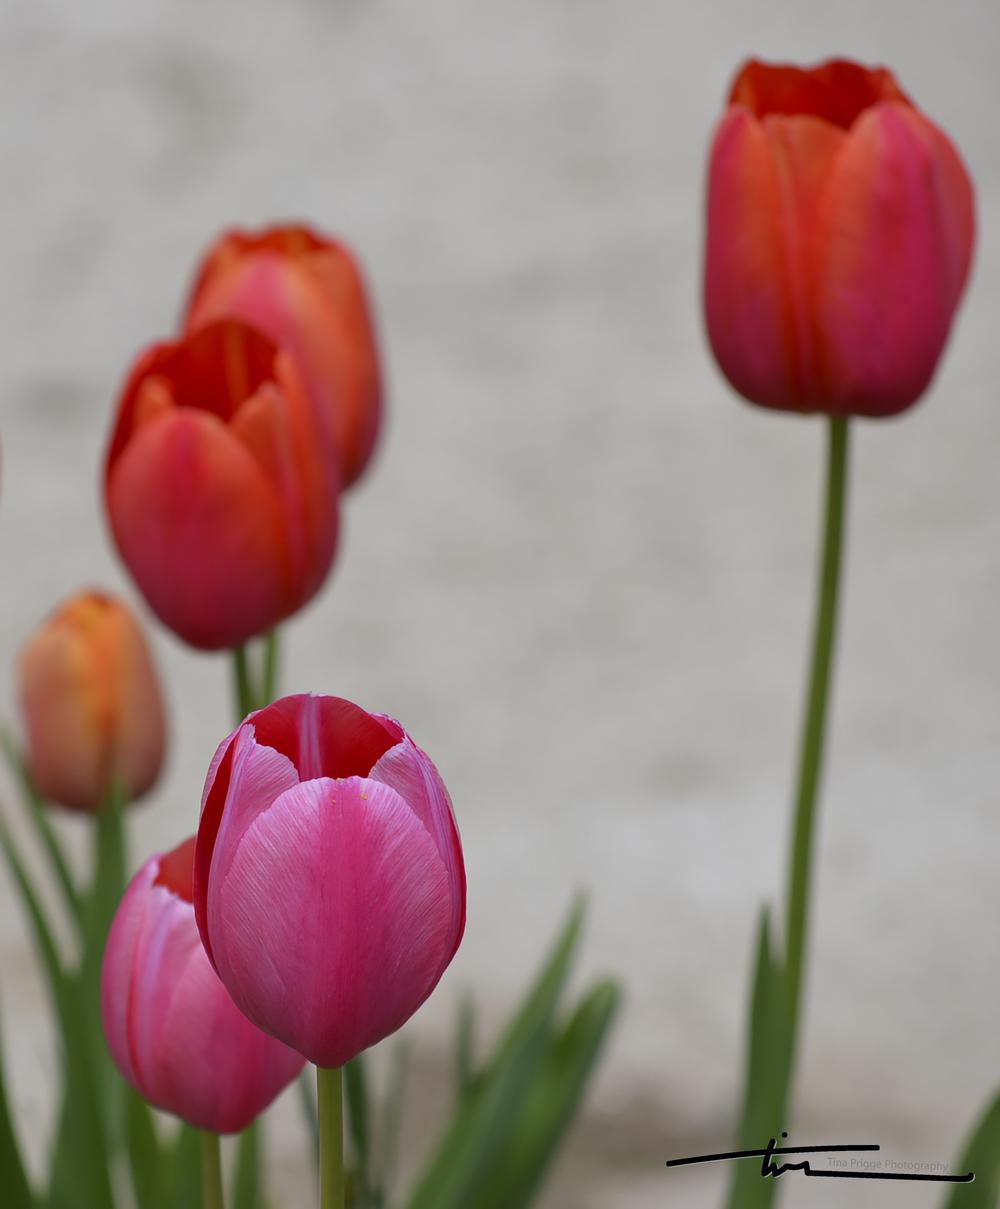 Tulips 009.jpg